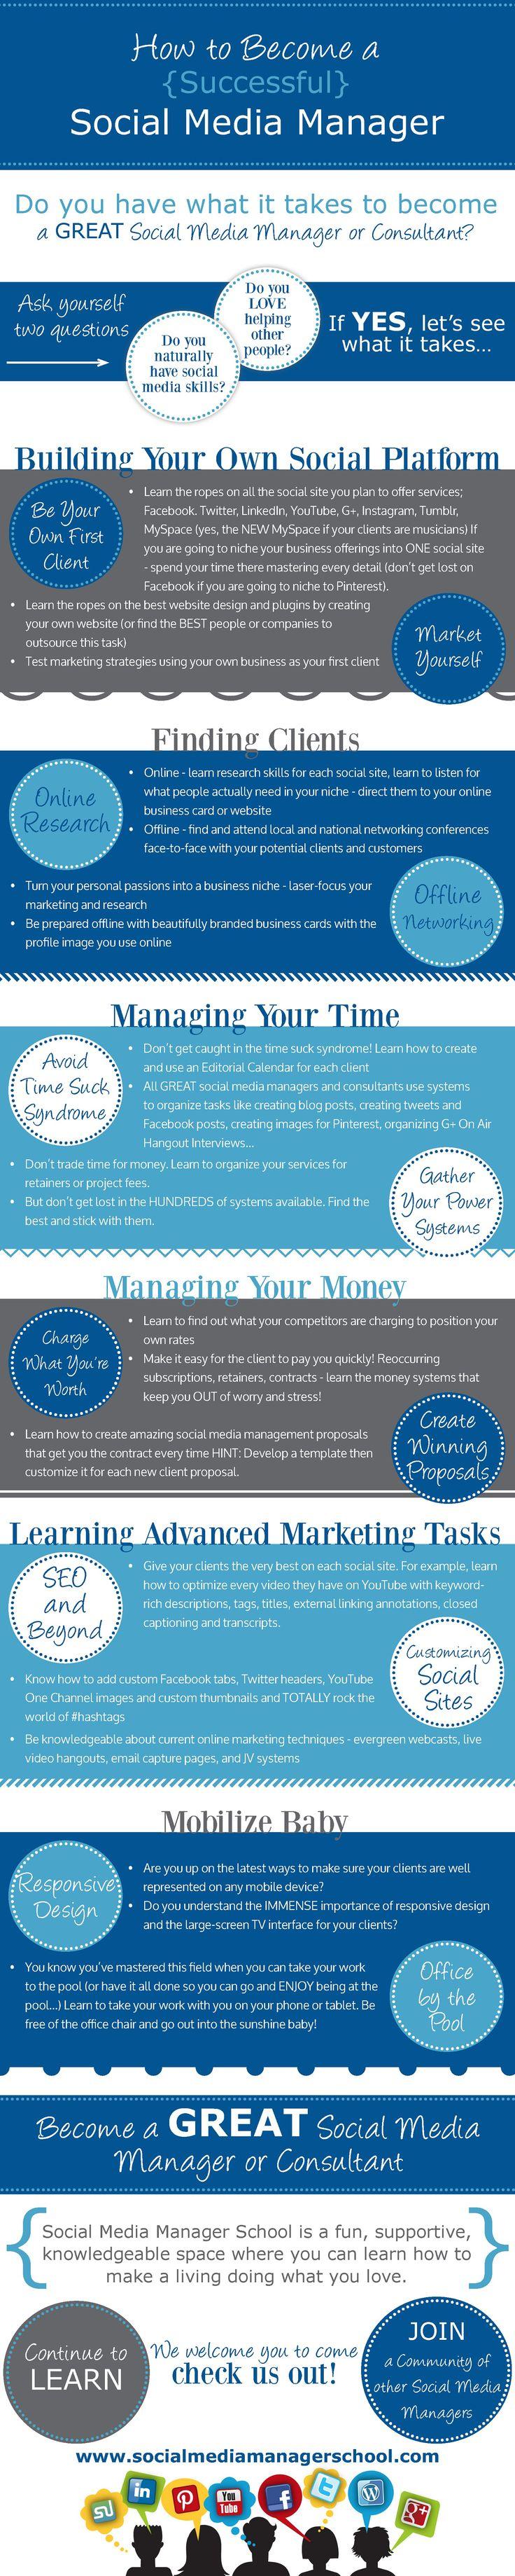 How to become a successful #socialmediamarketer